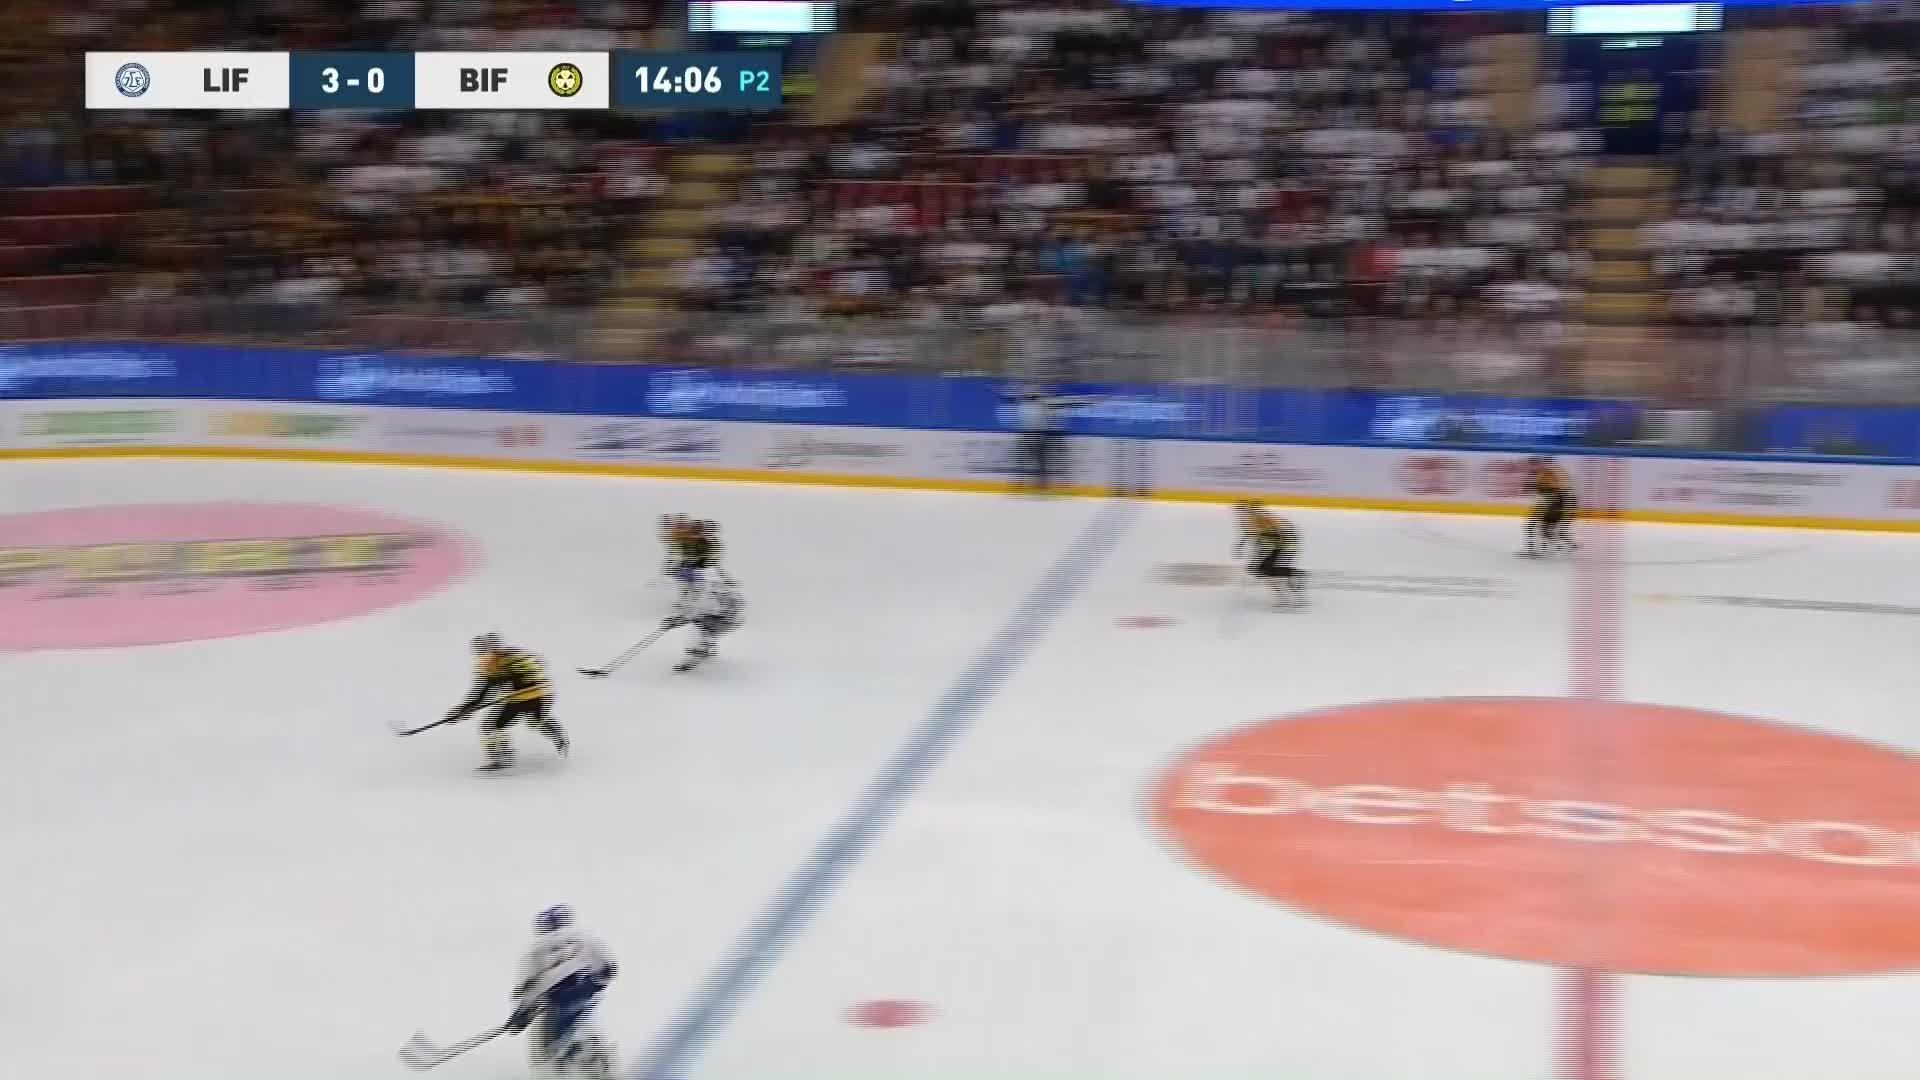 Leksands IF - Brynäs IF 4-0